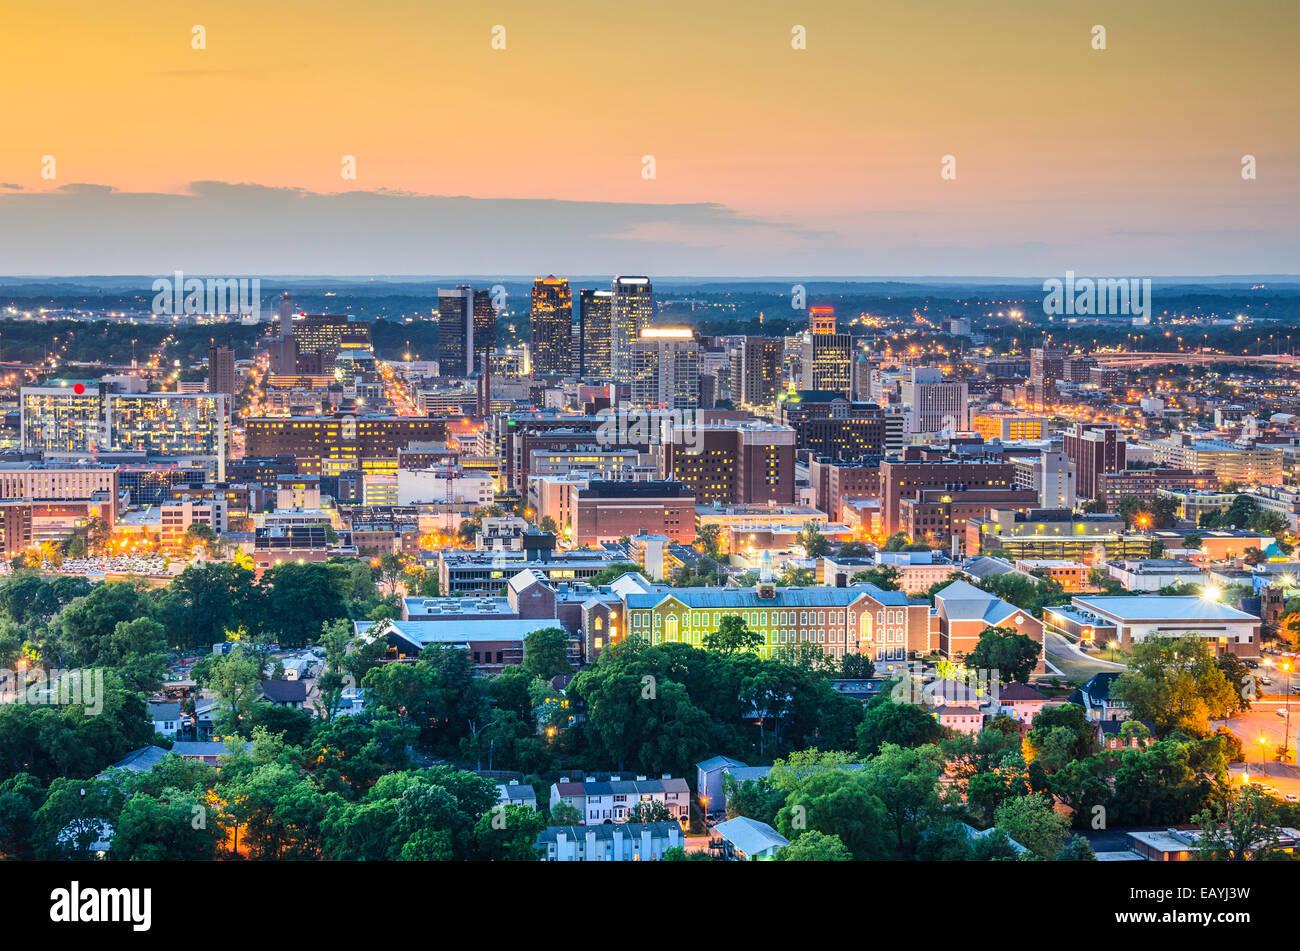 Birmingham, Alabama, USA downtown skyline. - Stock Image